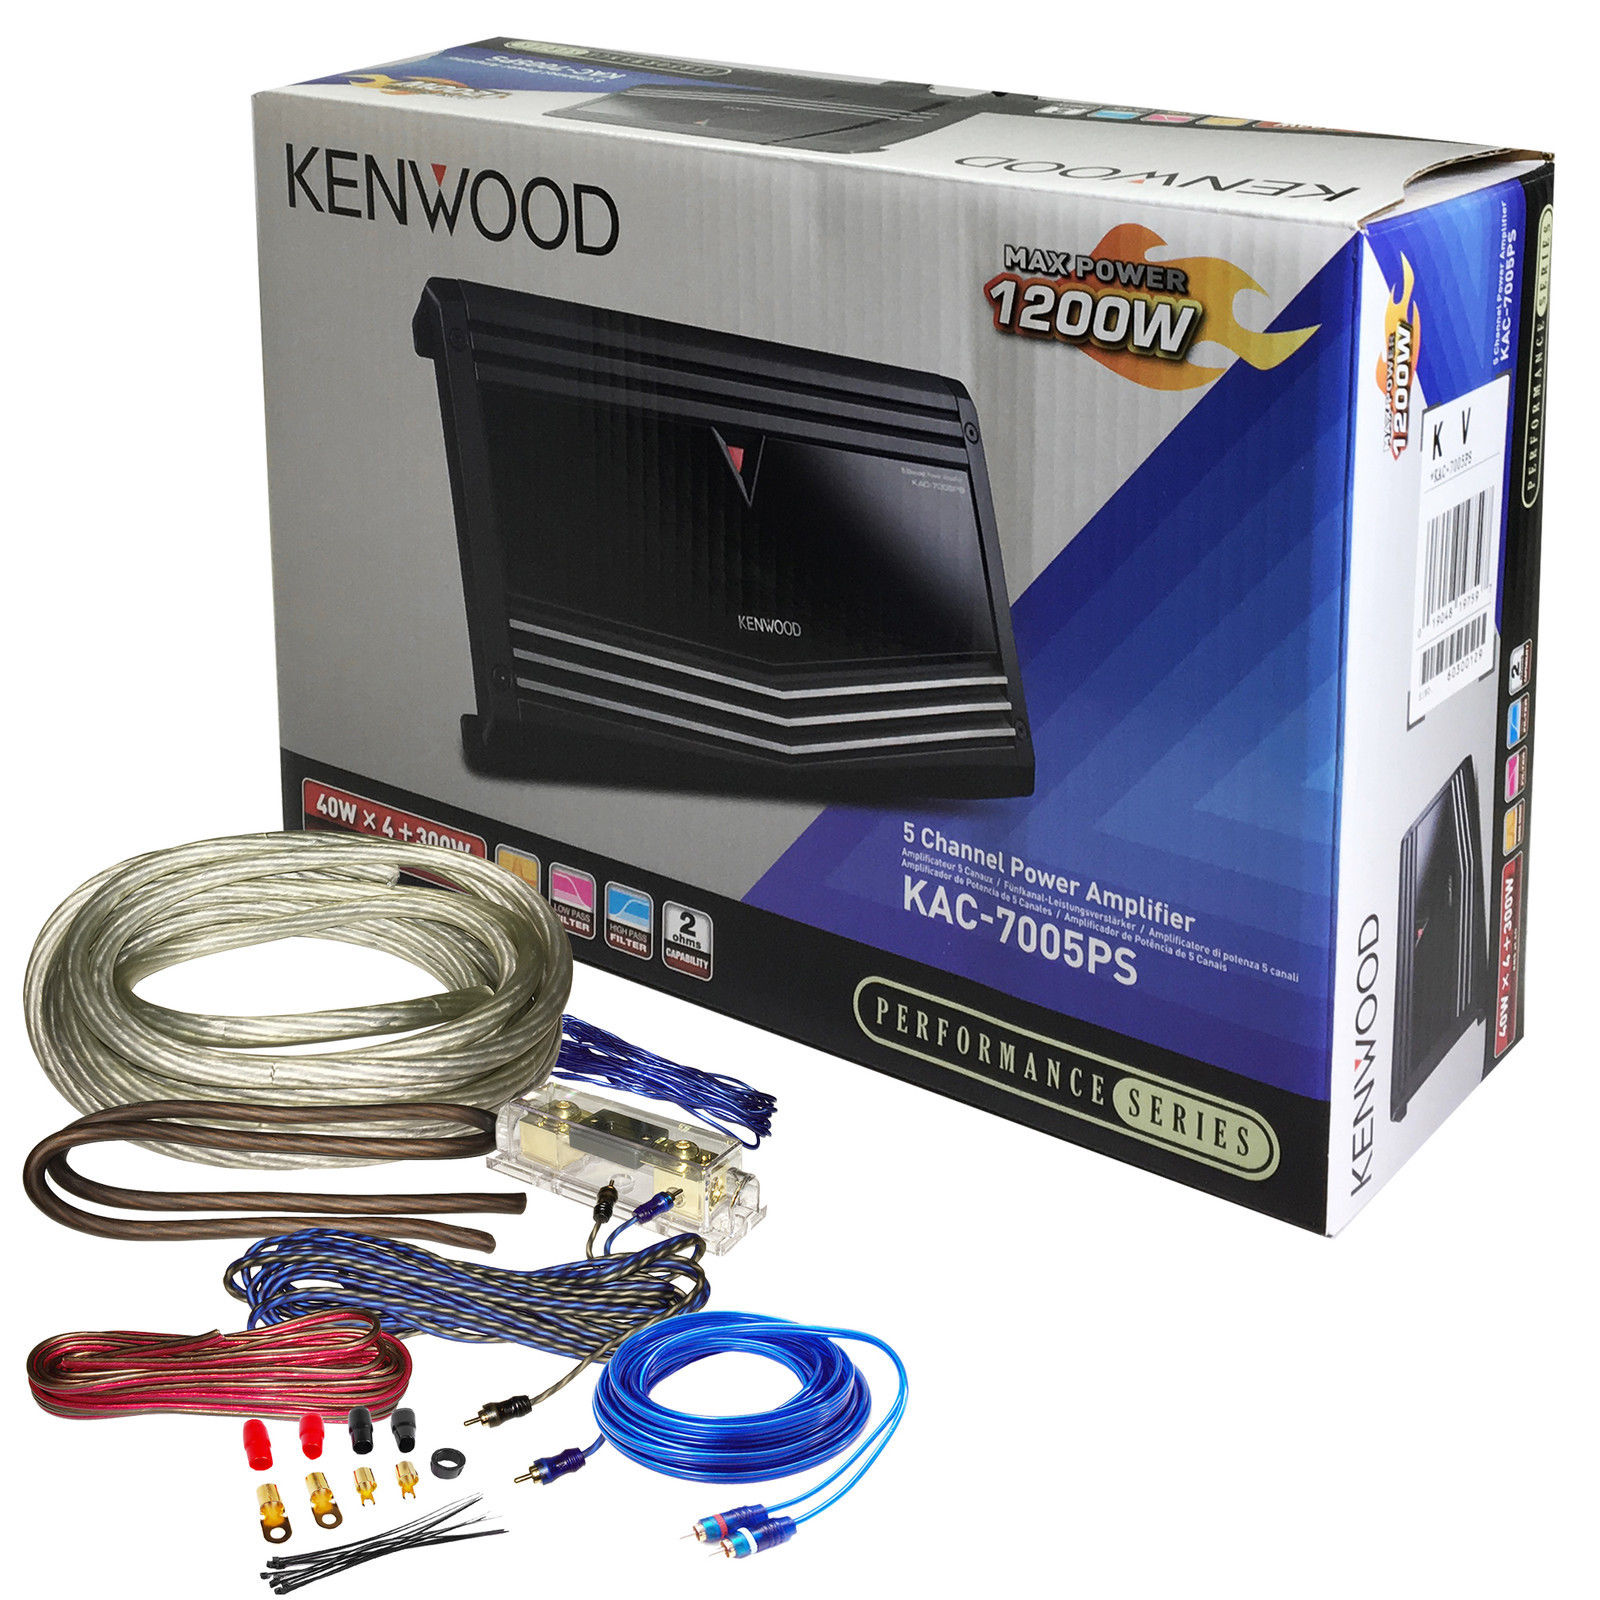 medium resolution of kenwood kac 7005ps 700w rms 5 channel car amplifier 1200w w wiringkenwood kac 7005ps 700w rms